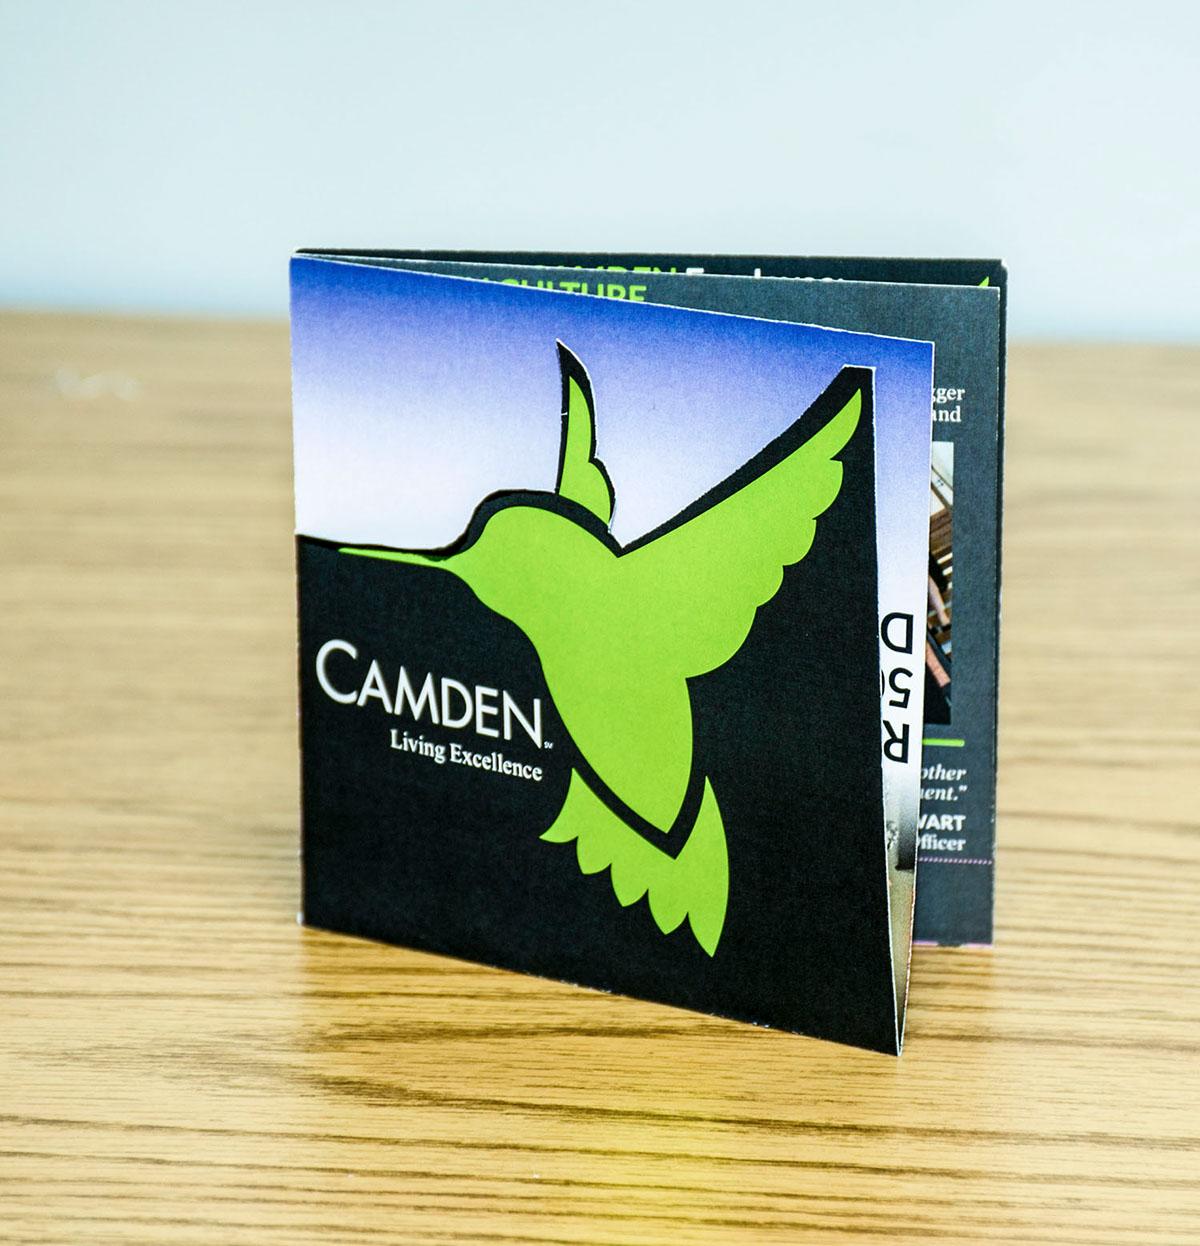 recruitment brochure camdenliving com on behance